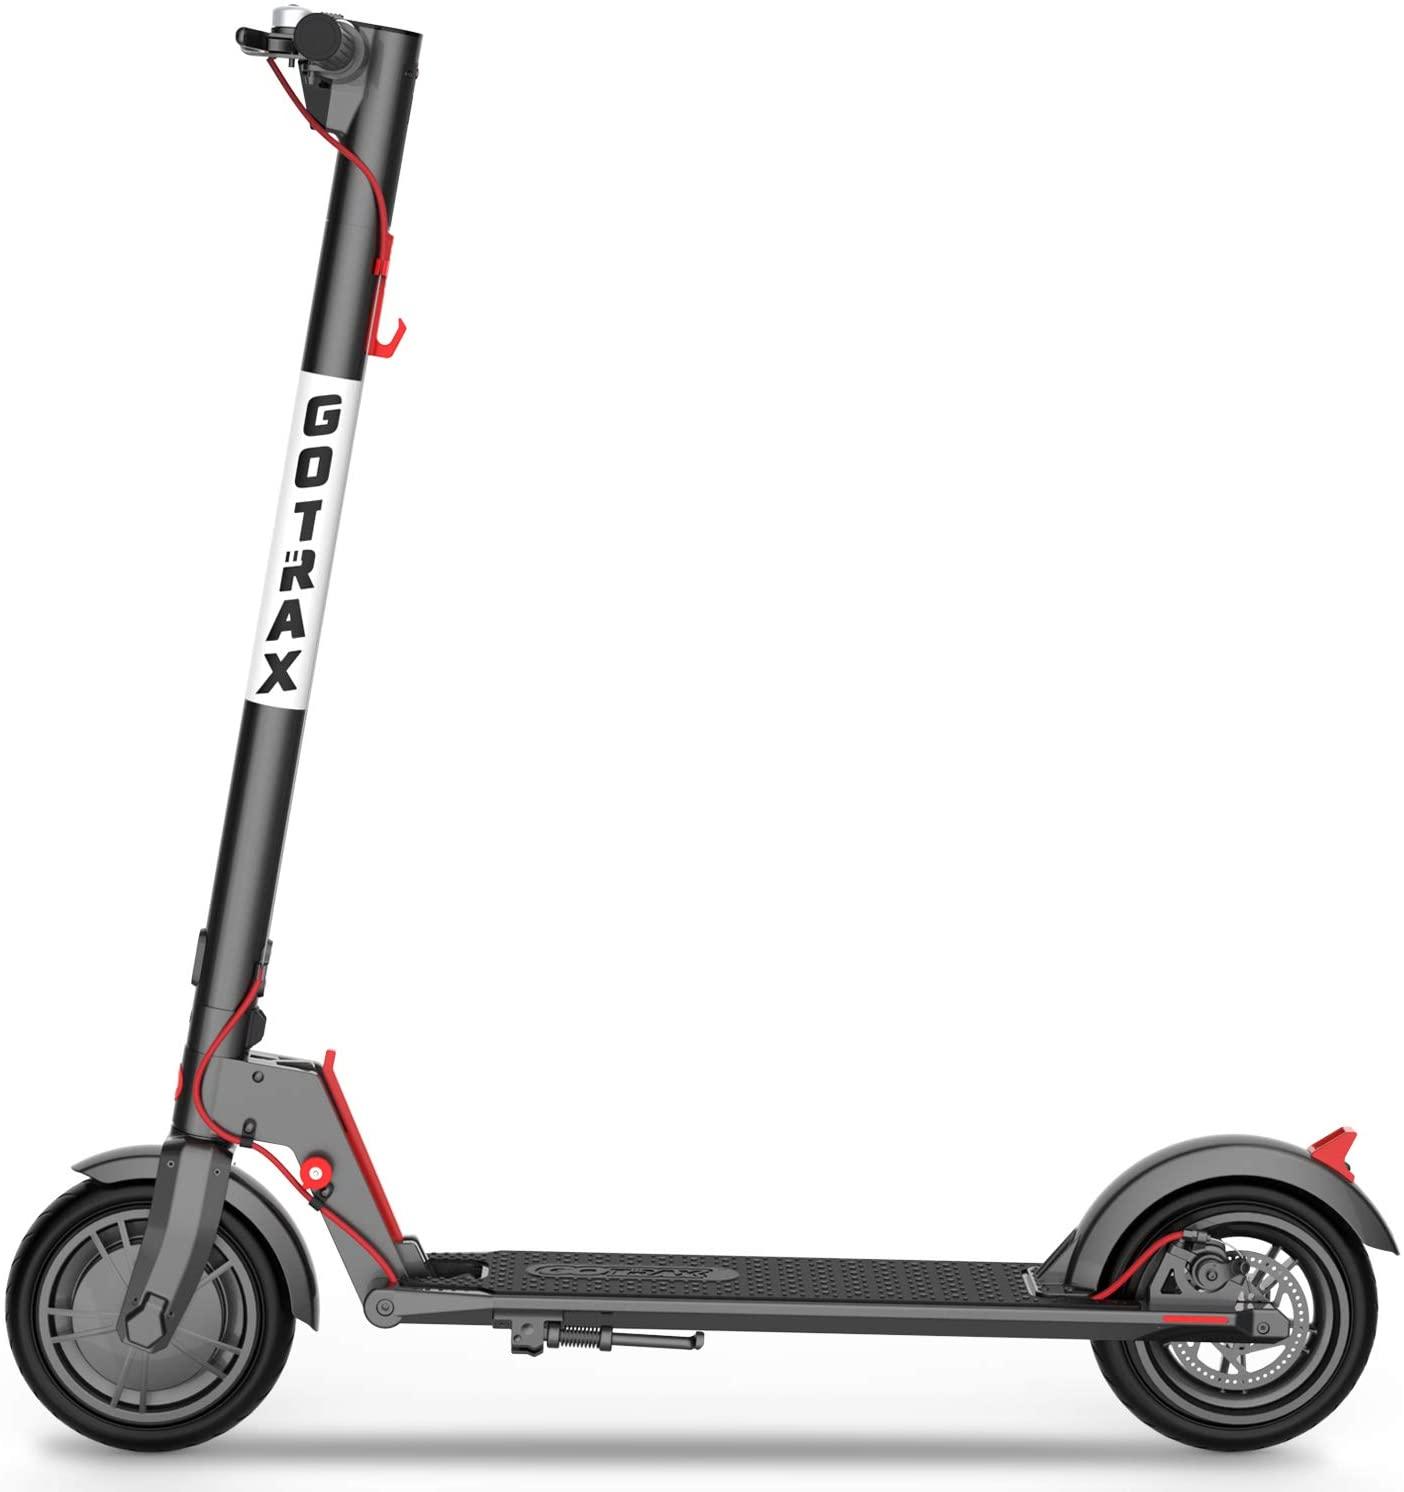 Gotrax GXL V2 Commuting Electric Scooter 电动滑板车